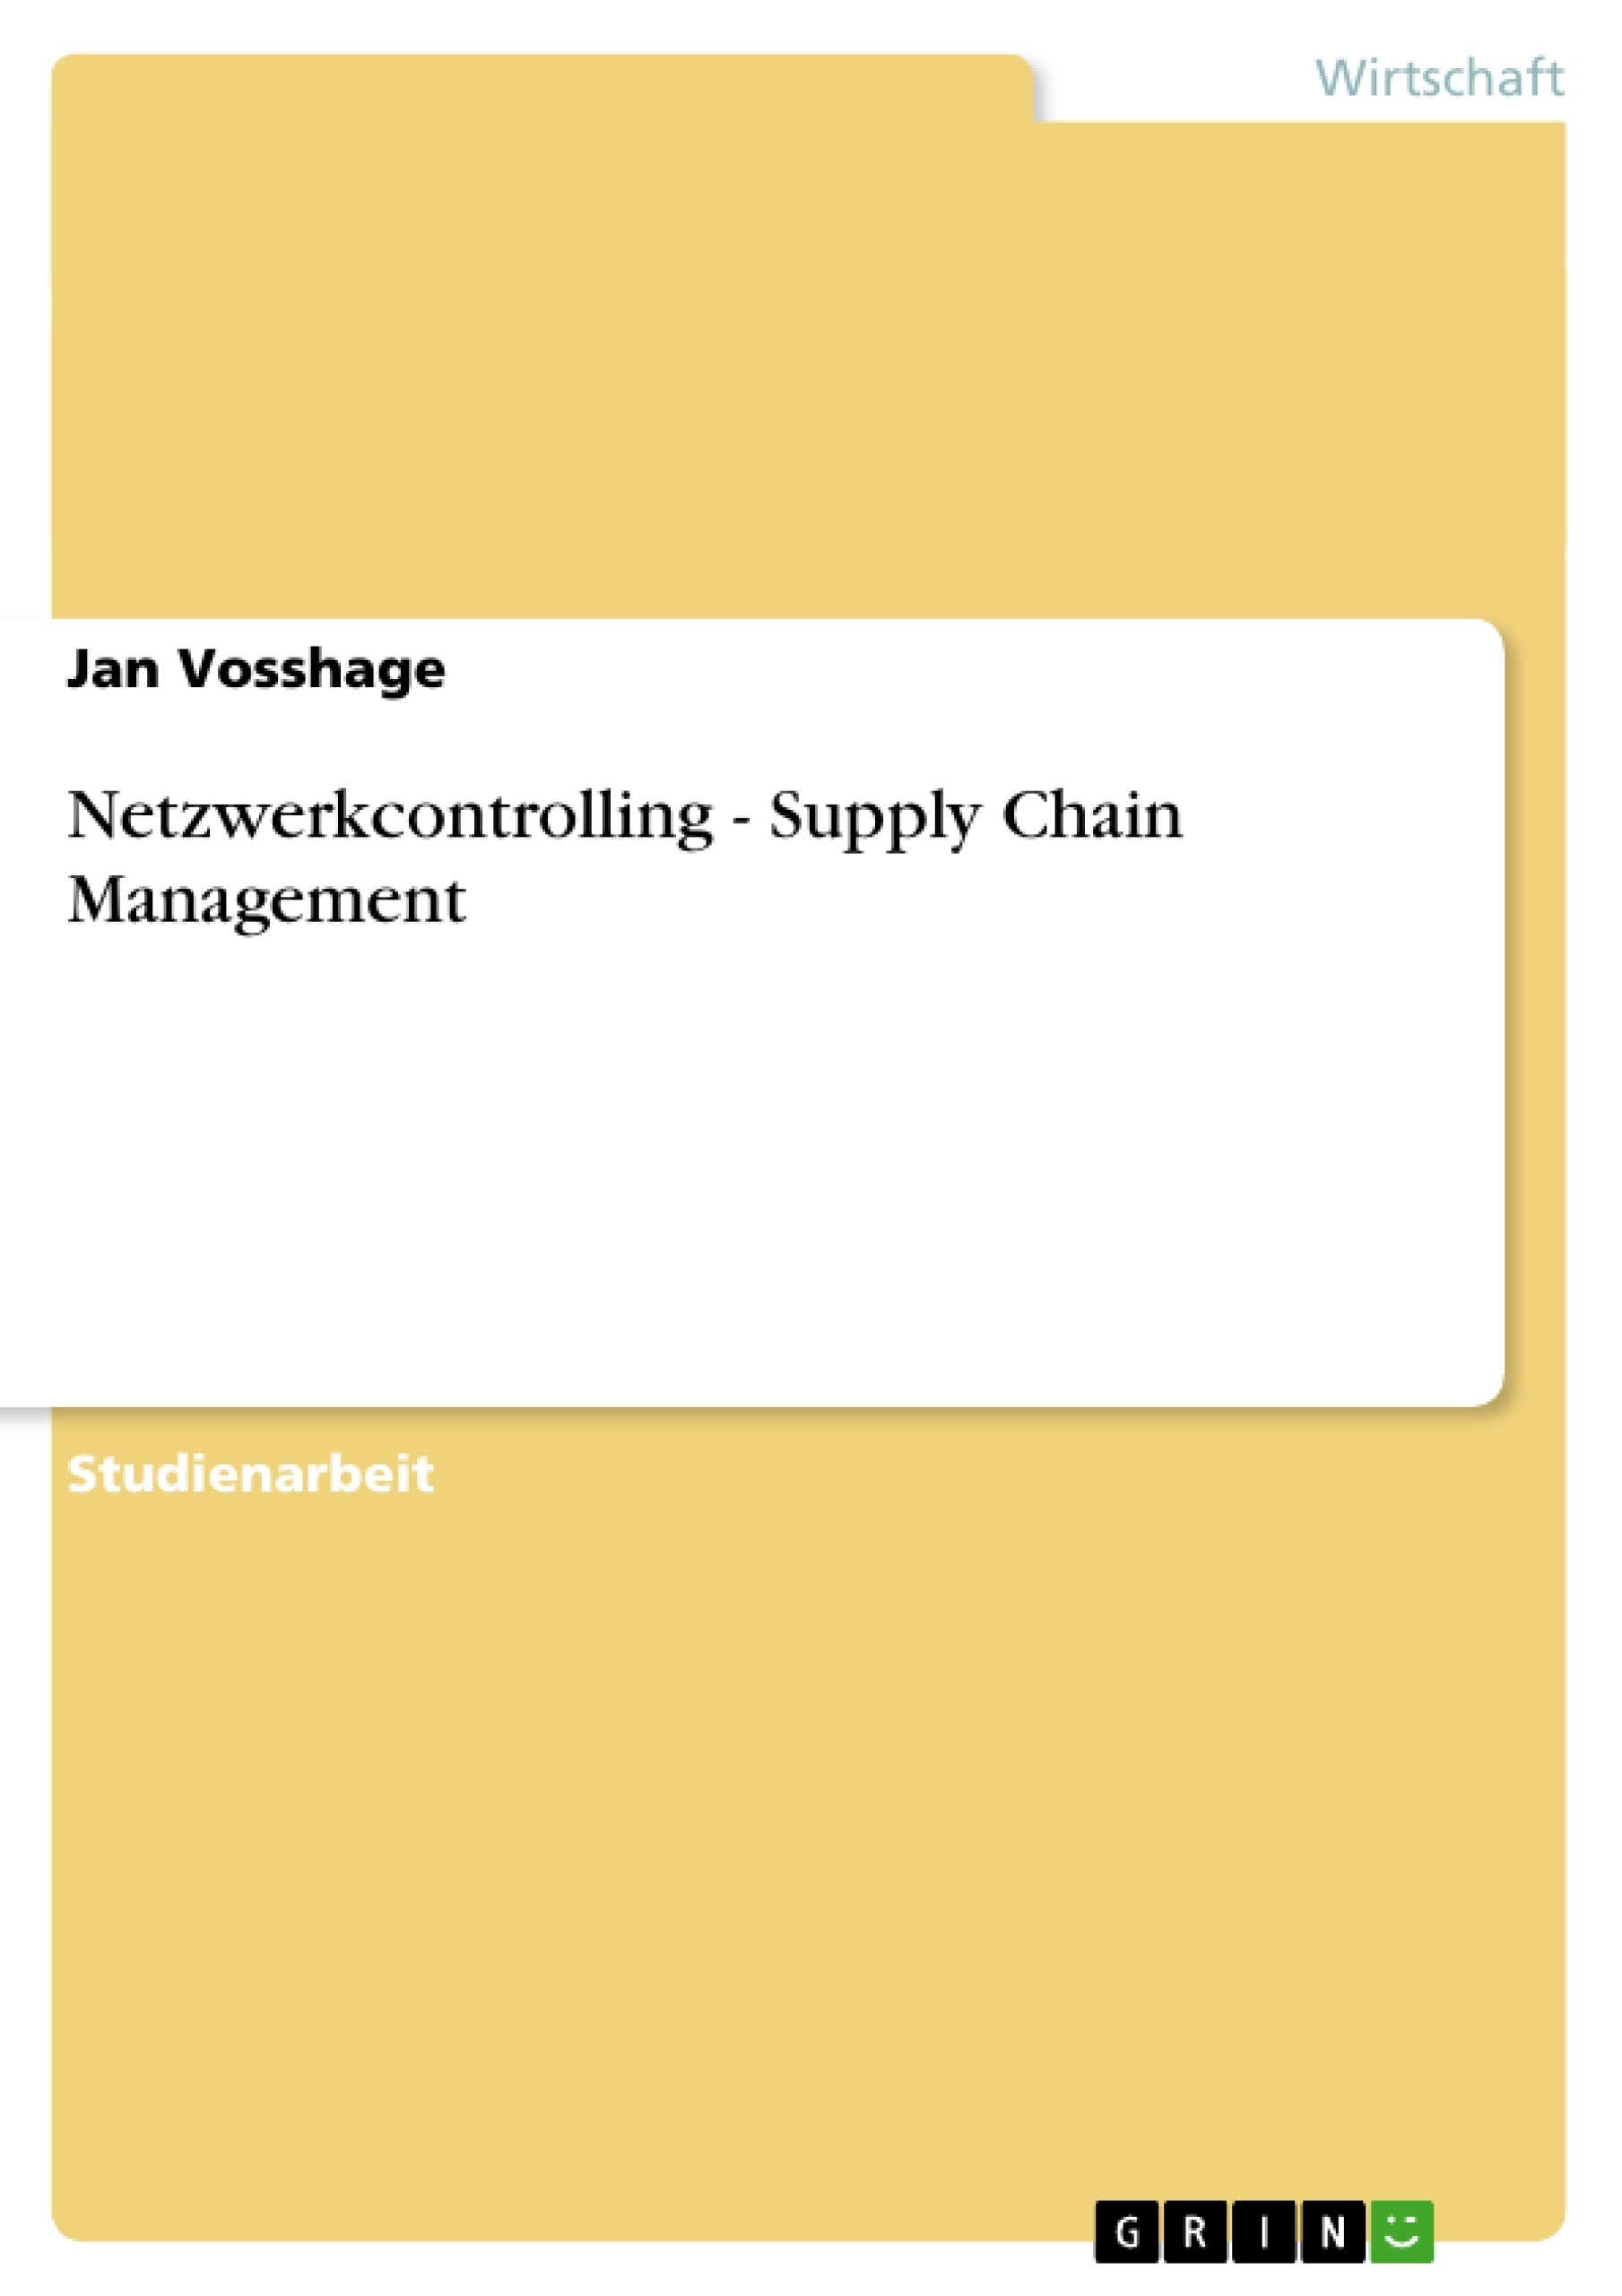 Titel: Netzwerkcontrolling - Supply Chain Management